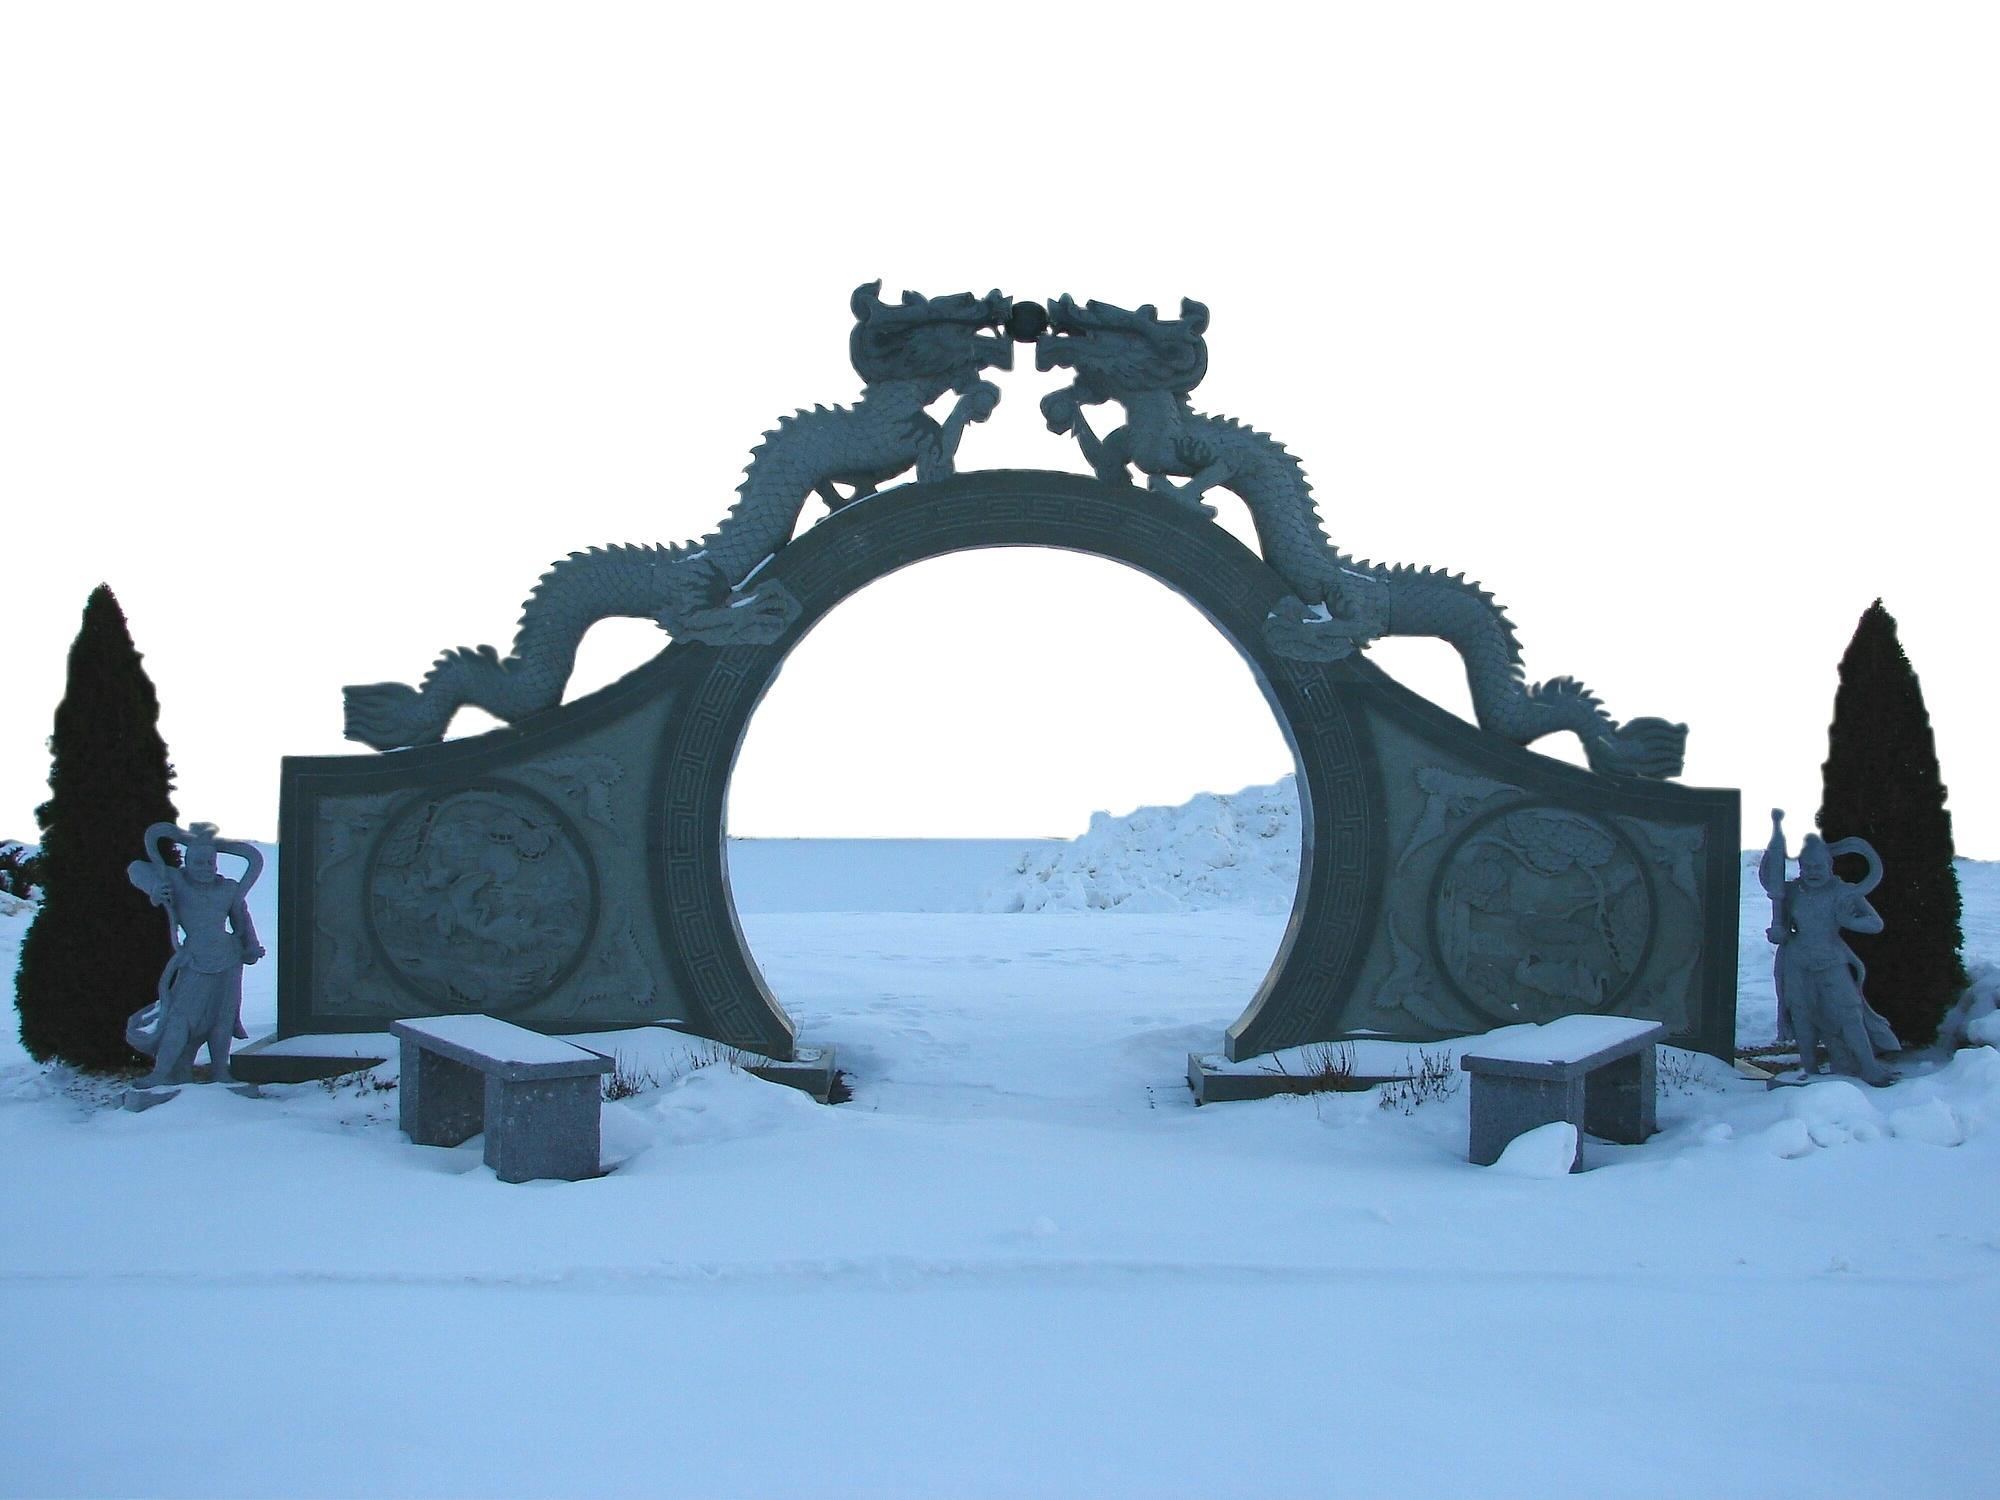 Dragon Gate Image from fantasystock.deviantart.com